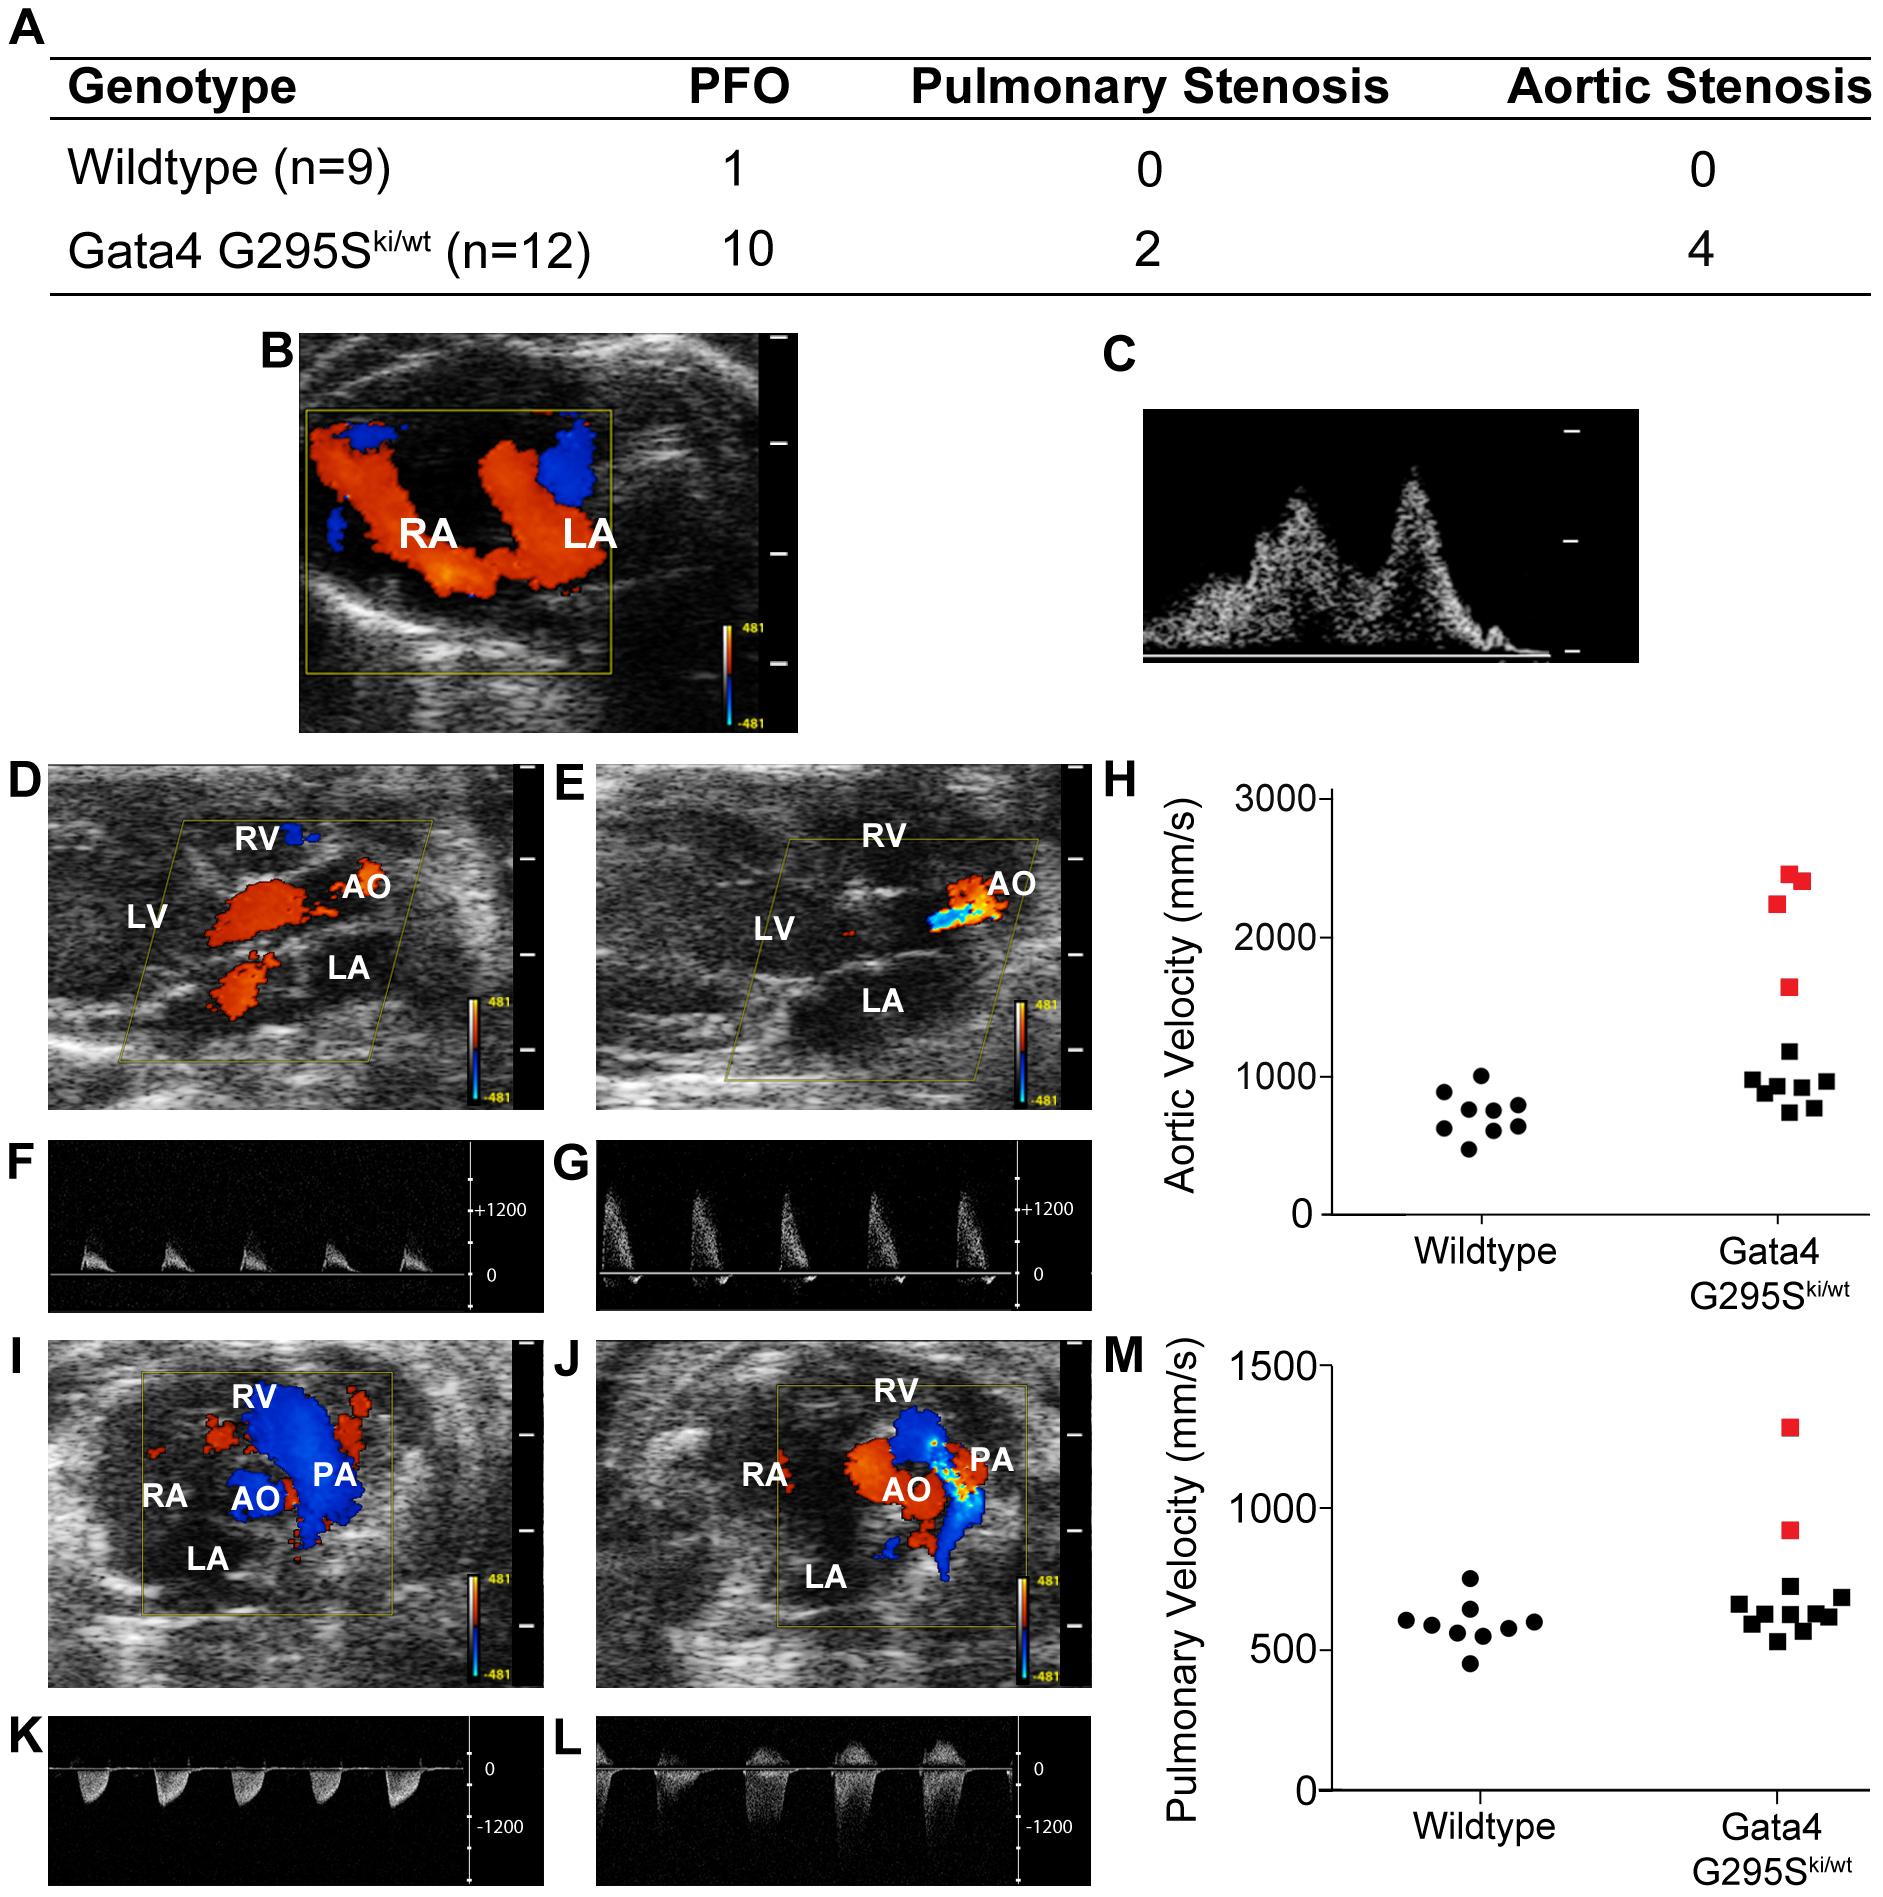 Atrial septal defects and semilunar valve stenosis in <i>Gata4 G295S<sup>ki/wt</sup></i> mice.